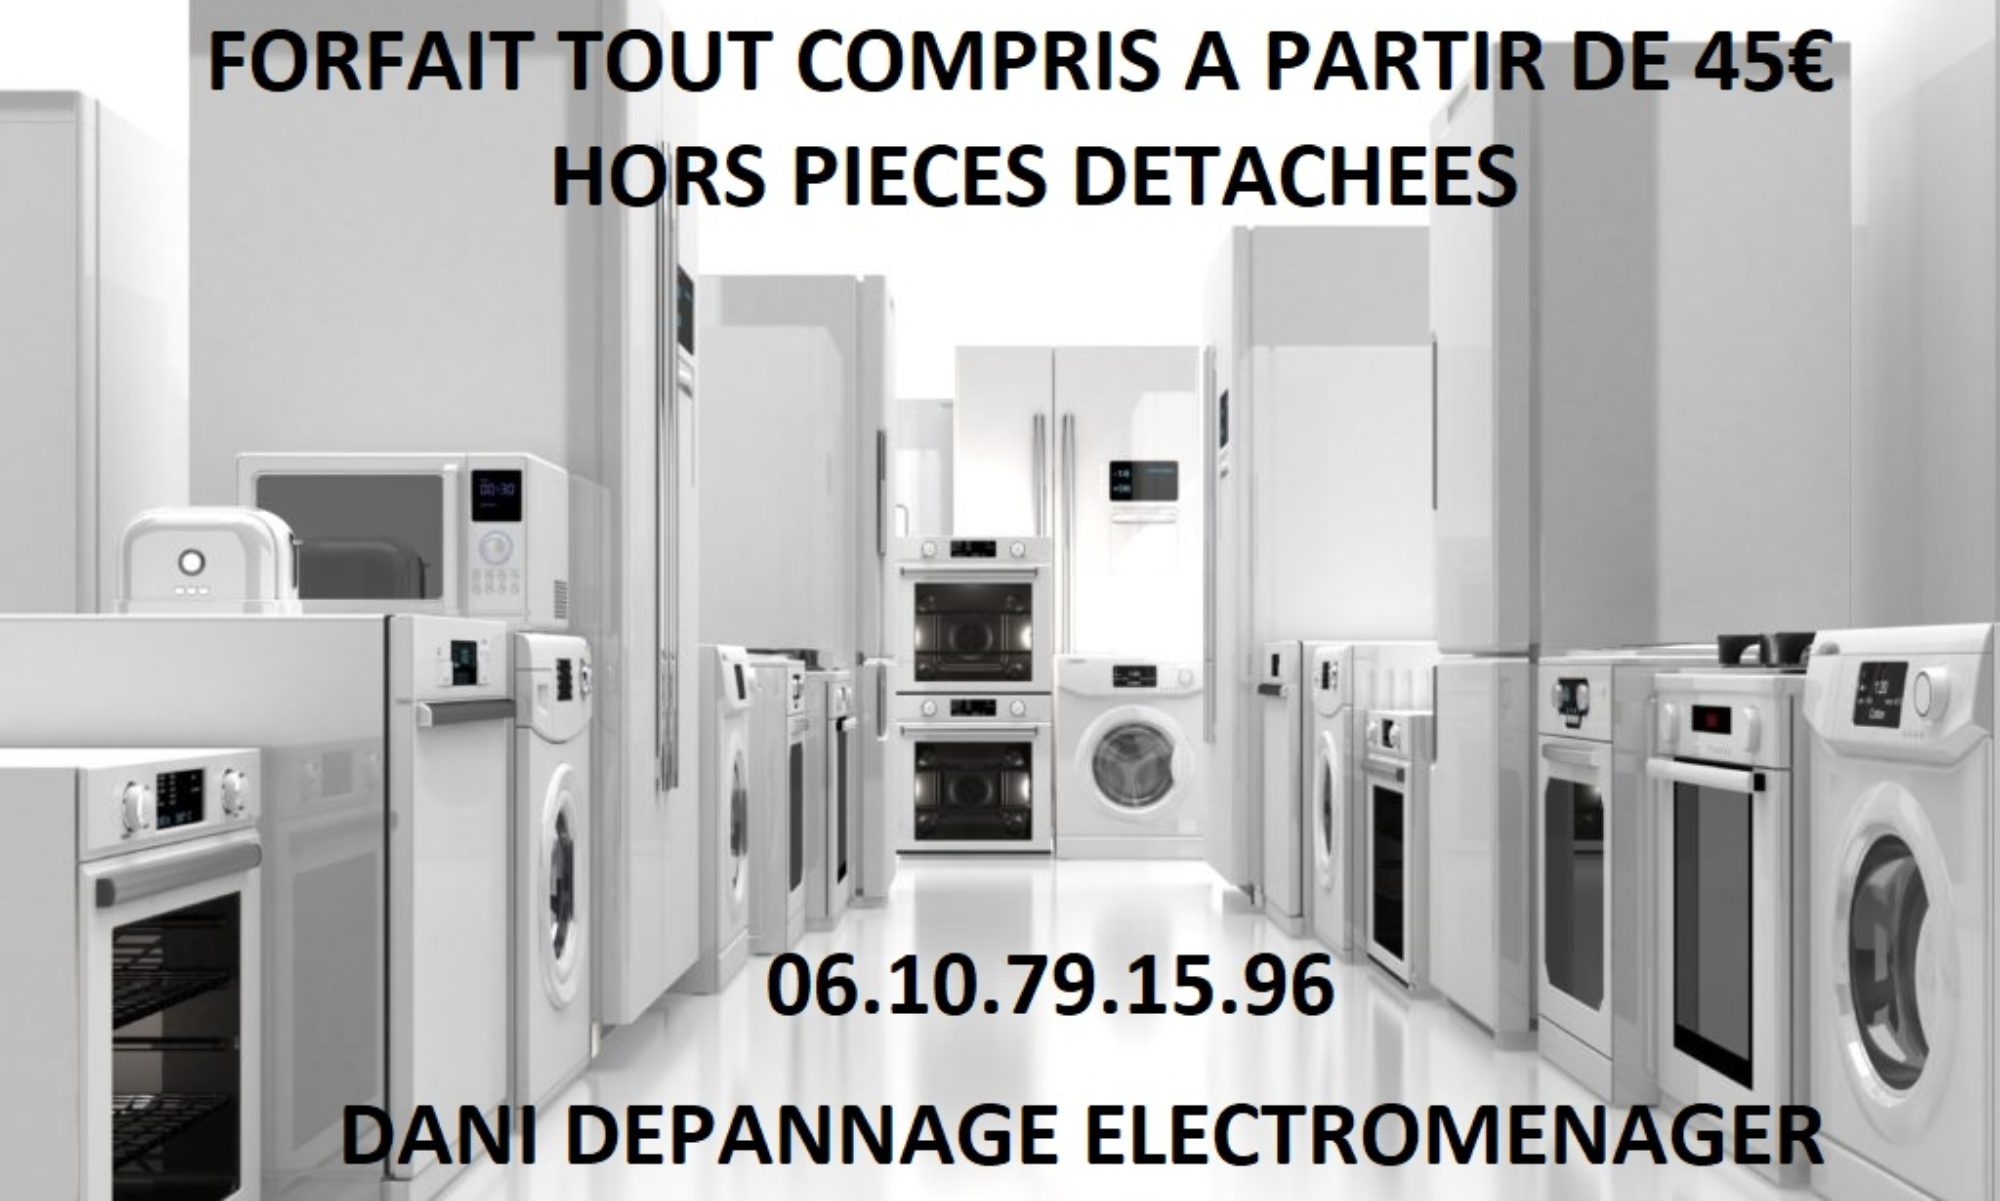 Dépannage Electroménager TV HI-FI Marignane  -  06 10 79 15 96